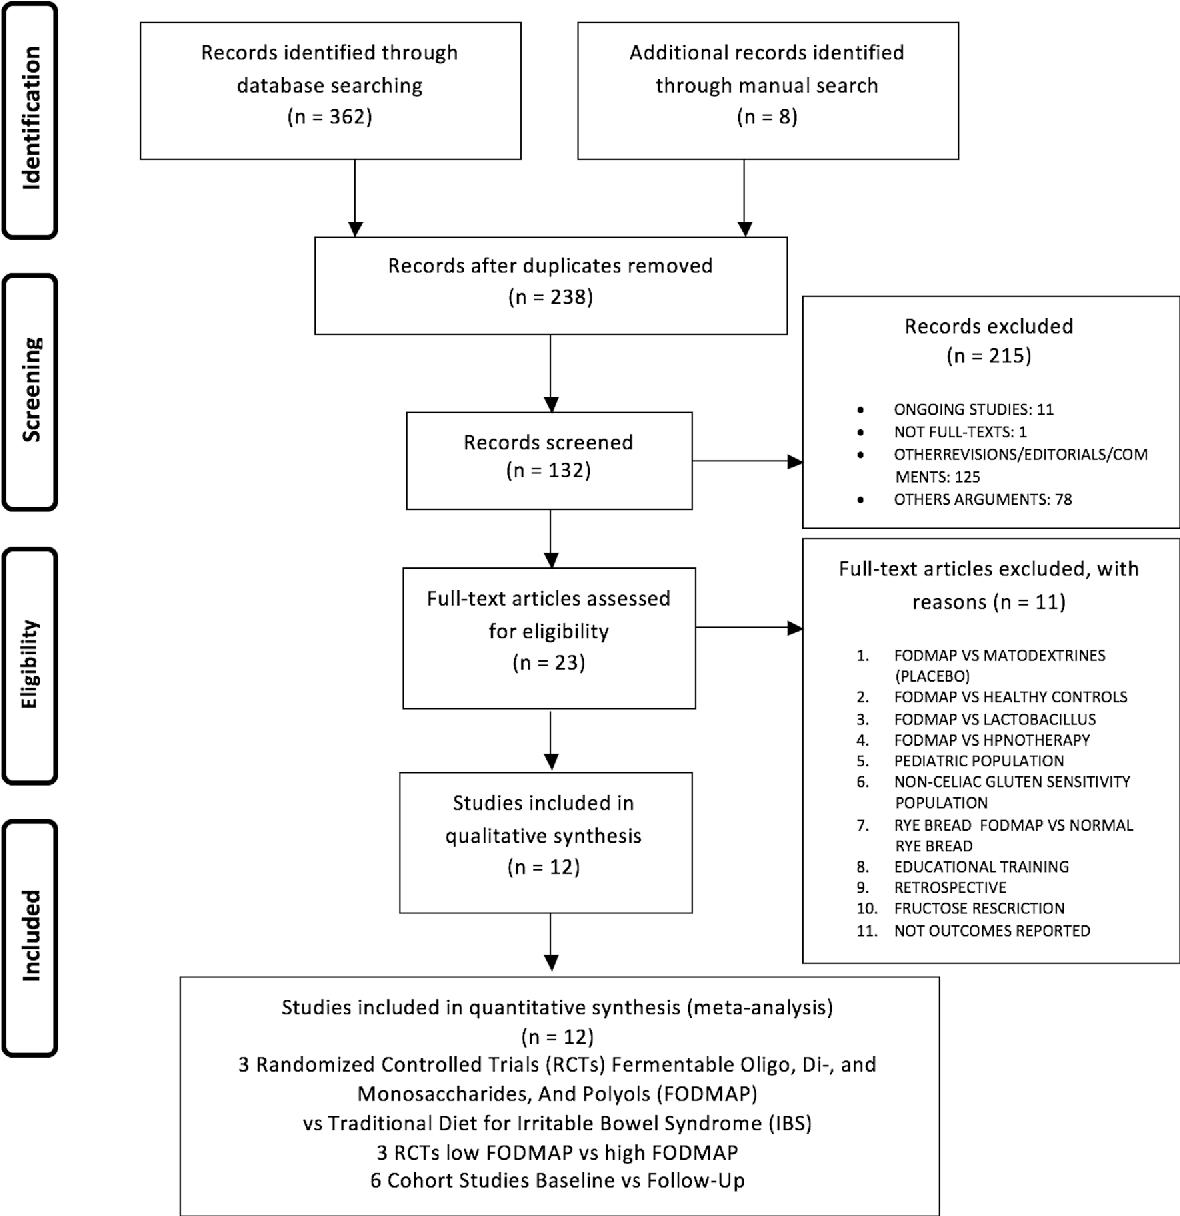 Pdf Low Fodmap Diet Improves Irritable Bowel Syndrome Symptoms A